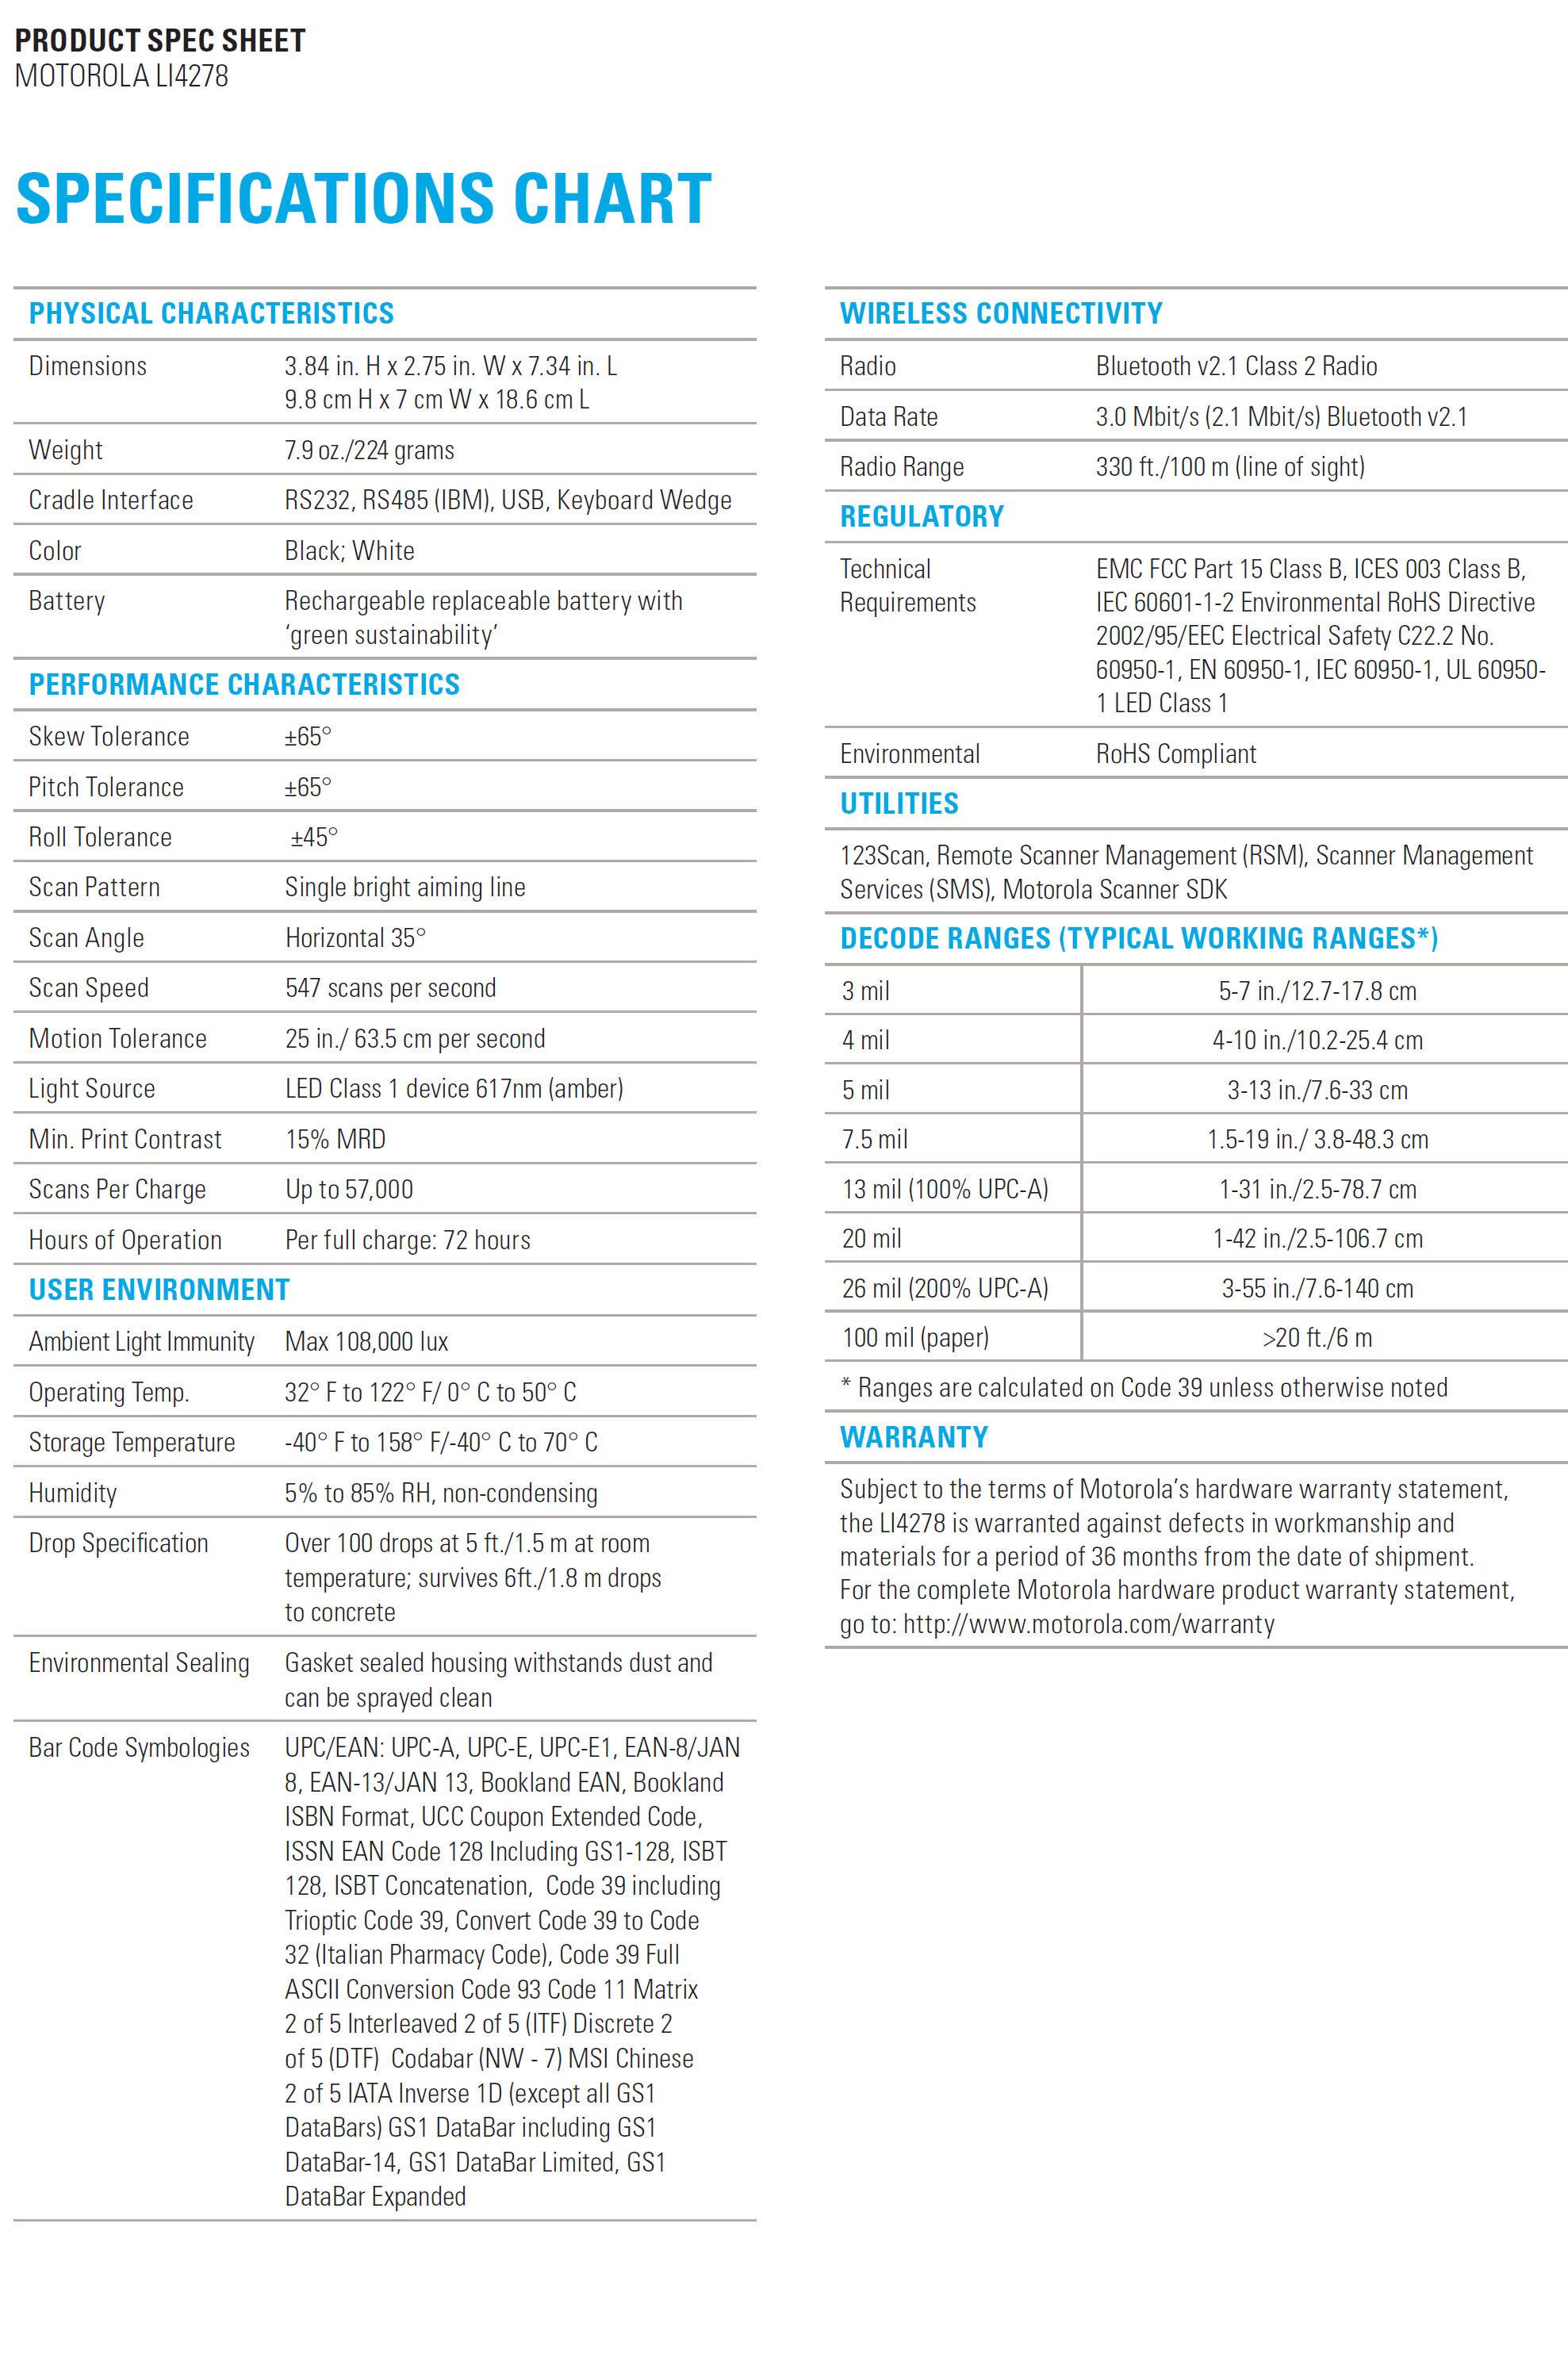 MOTOROLA LI4278 Cordless Linear Scanner | vtech